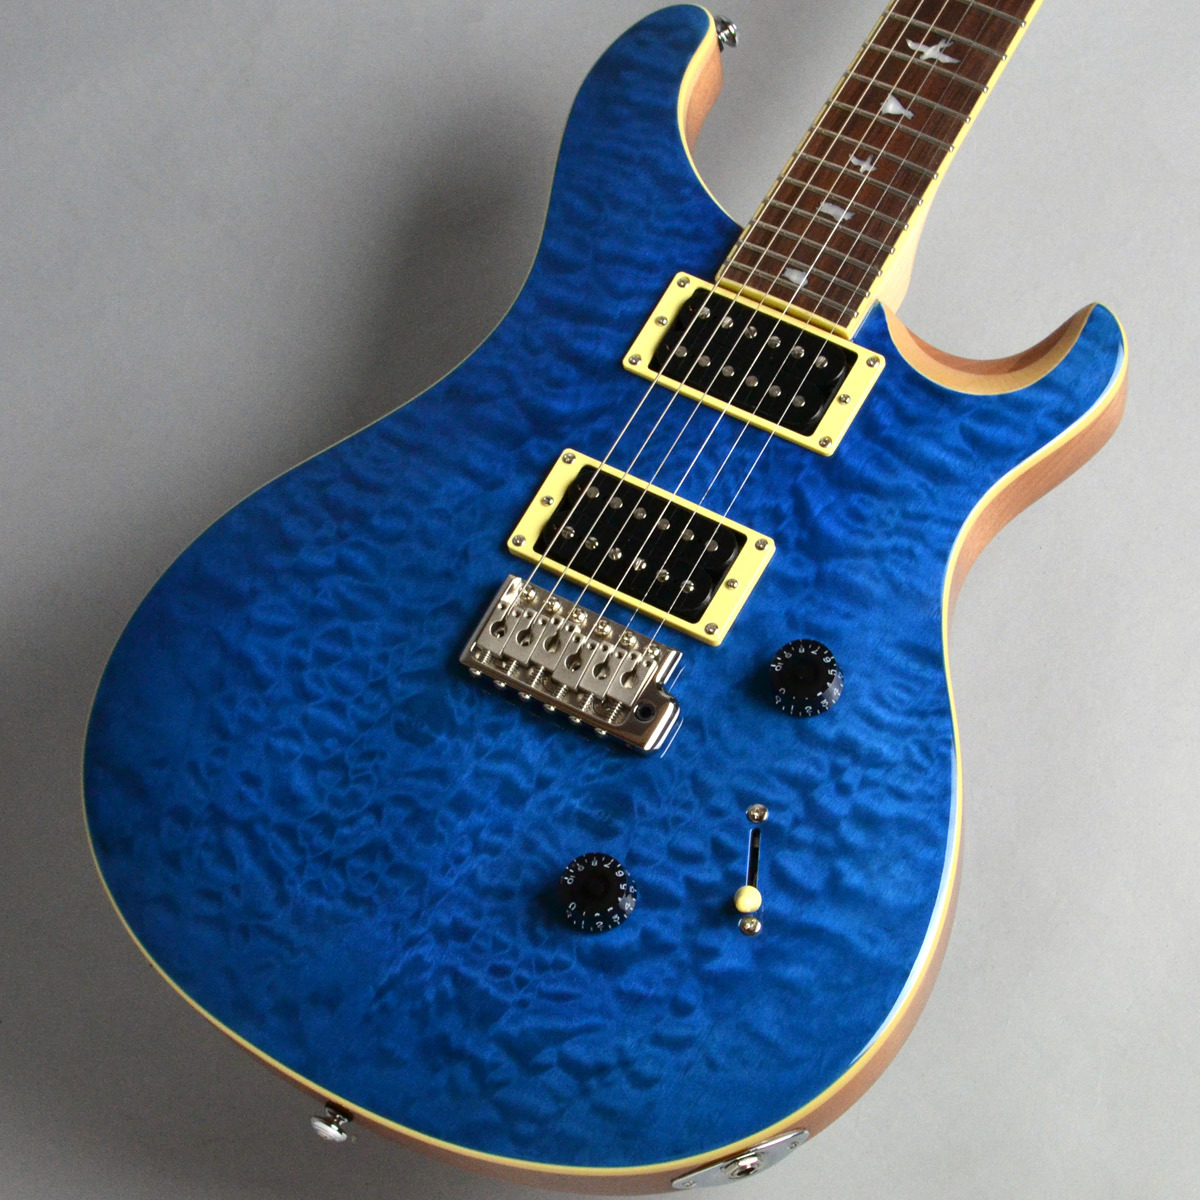 PRS Matteo SE エレキギター Custom24 Reed Quilted Maple/Blue Matteo エレキギター【ポールリードスミス(Paul Reed Smith) 島村楽器限定モデル】【新宿PePe店】, ボールドリック:56d12502 --- sunward.msk.ru